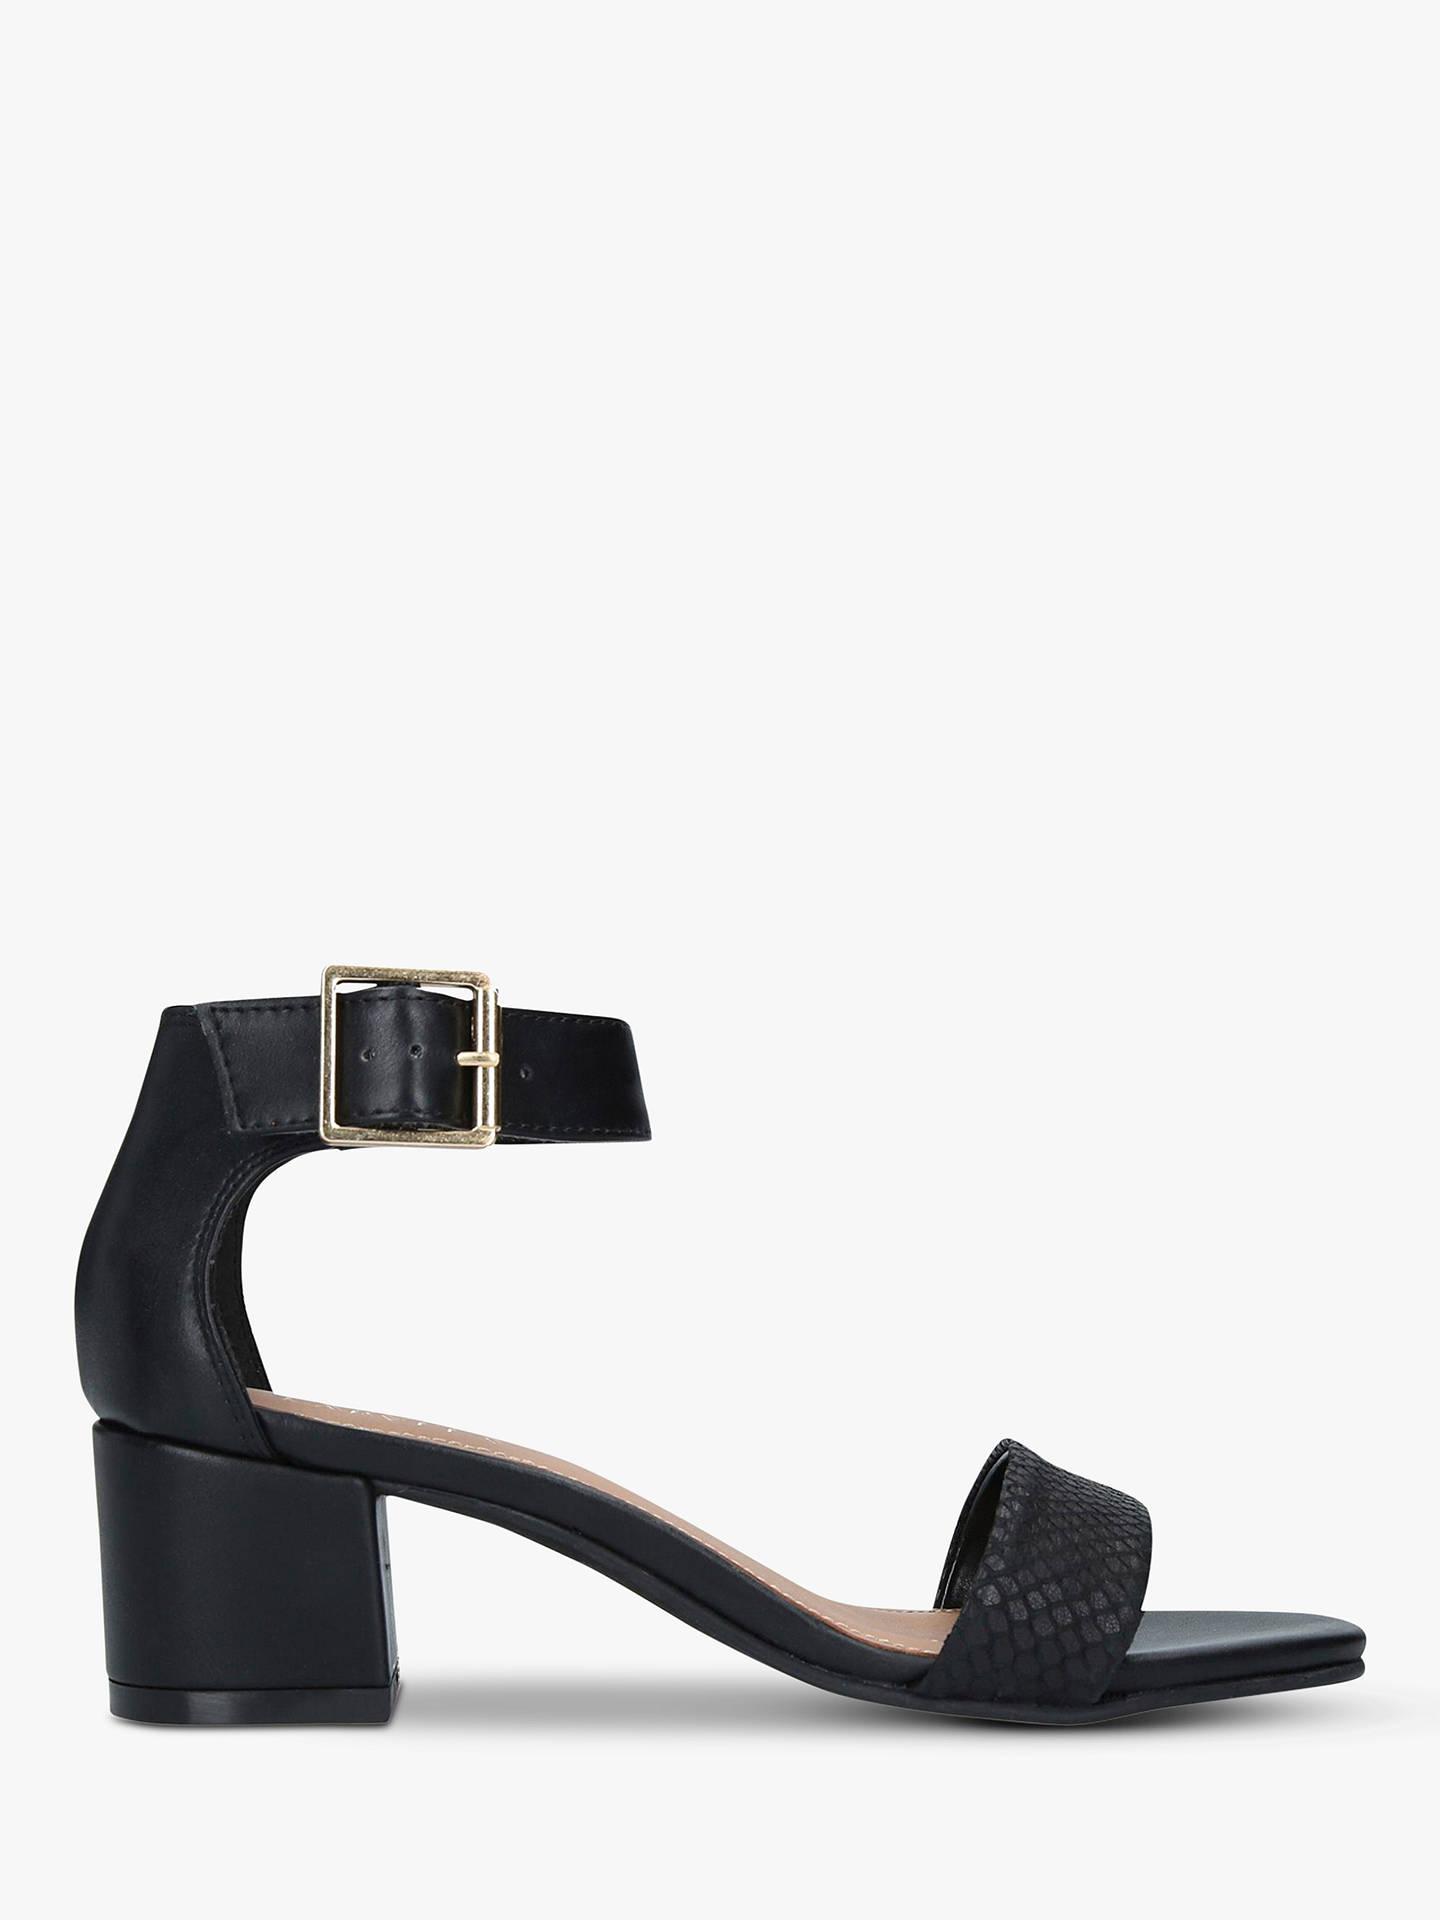 5fea91db4874 Carvela Shadow Leather Block Heel Sandals at John Lewis   Partners